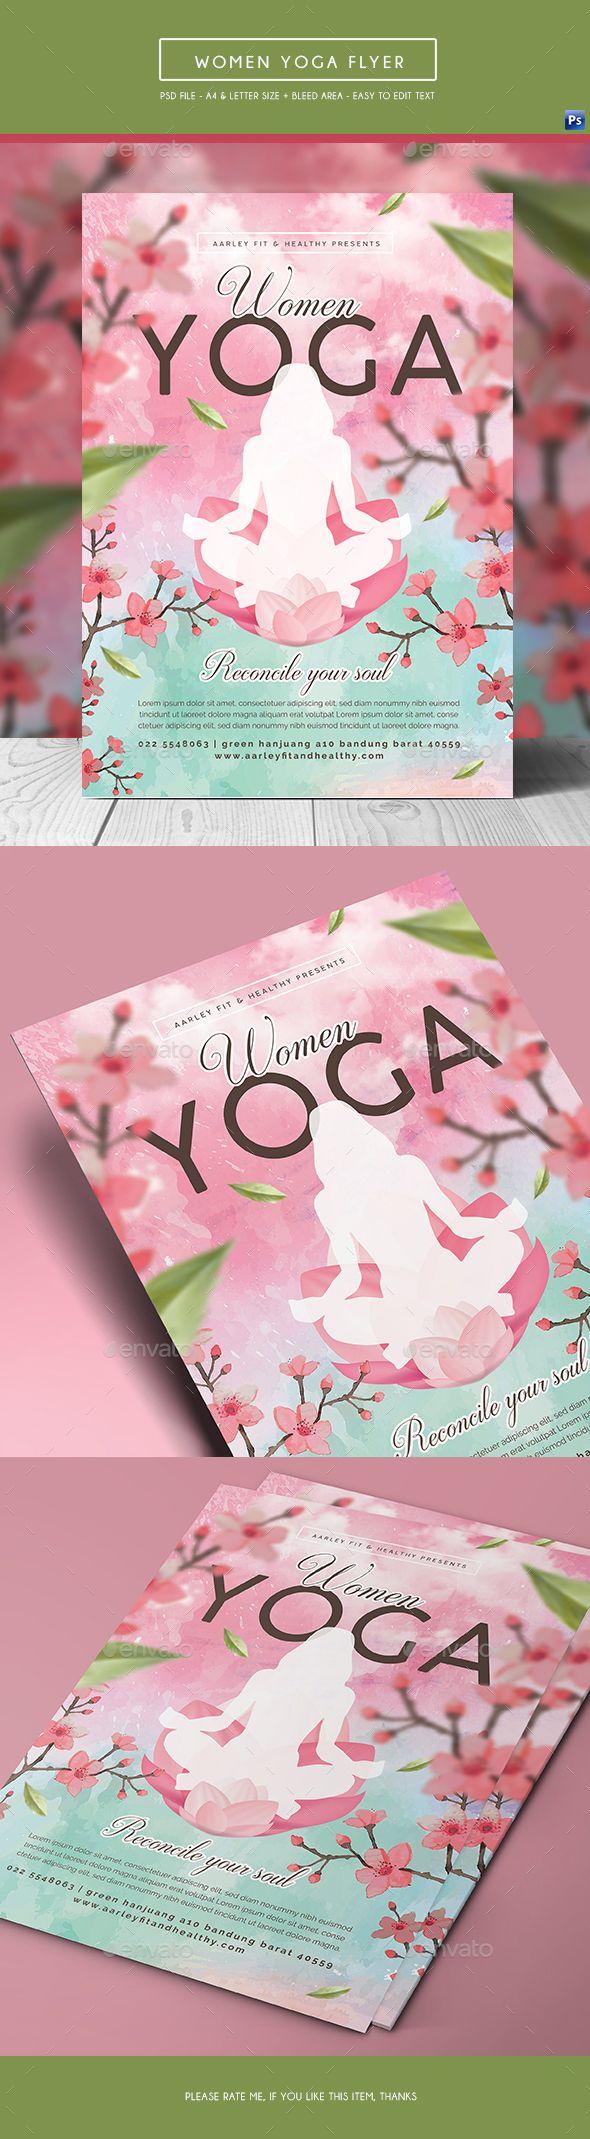 Women Yoga Flyer / Poster | Tarjetas presentacion y Tarjetas